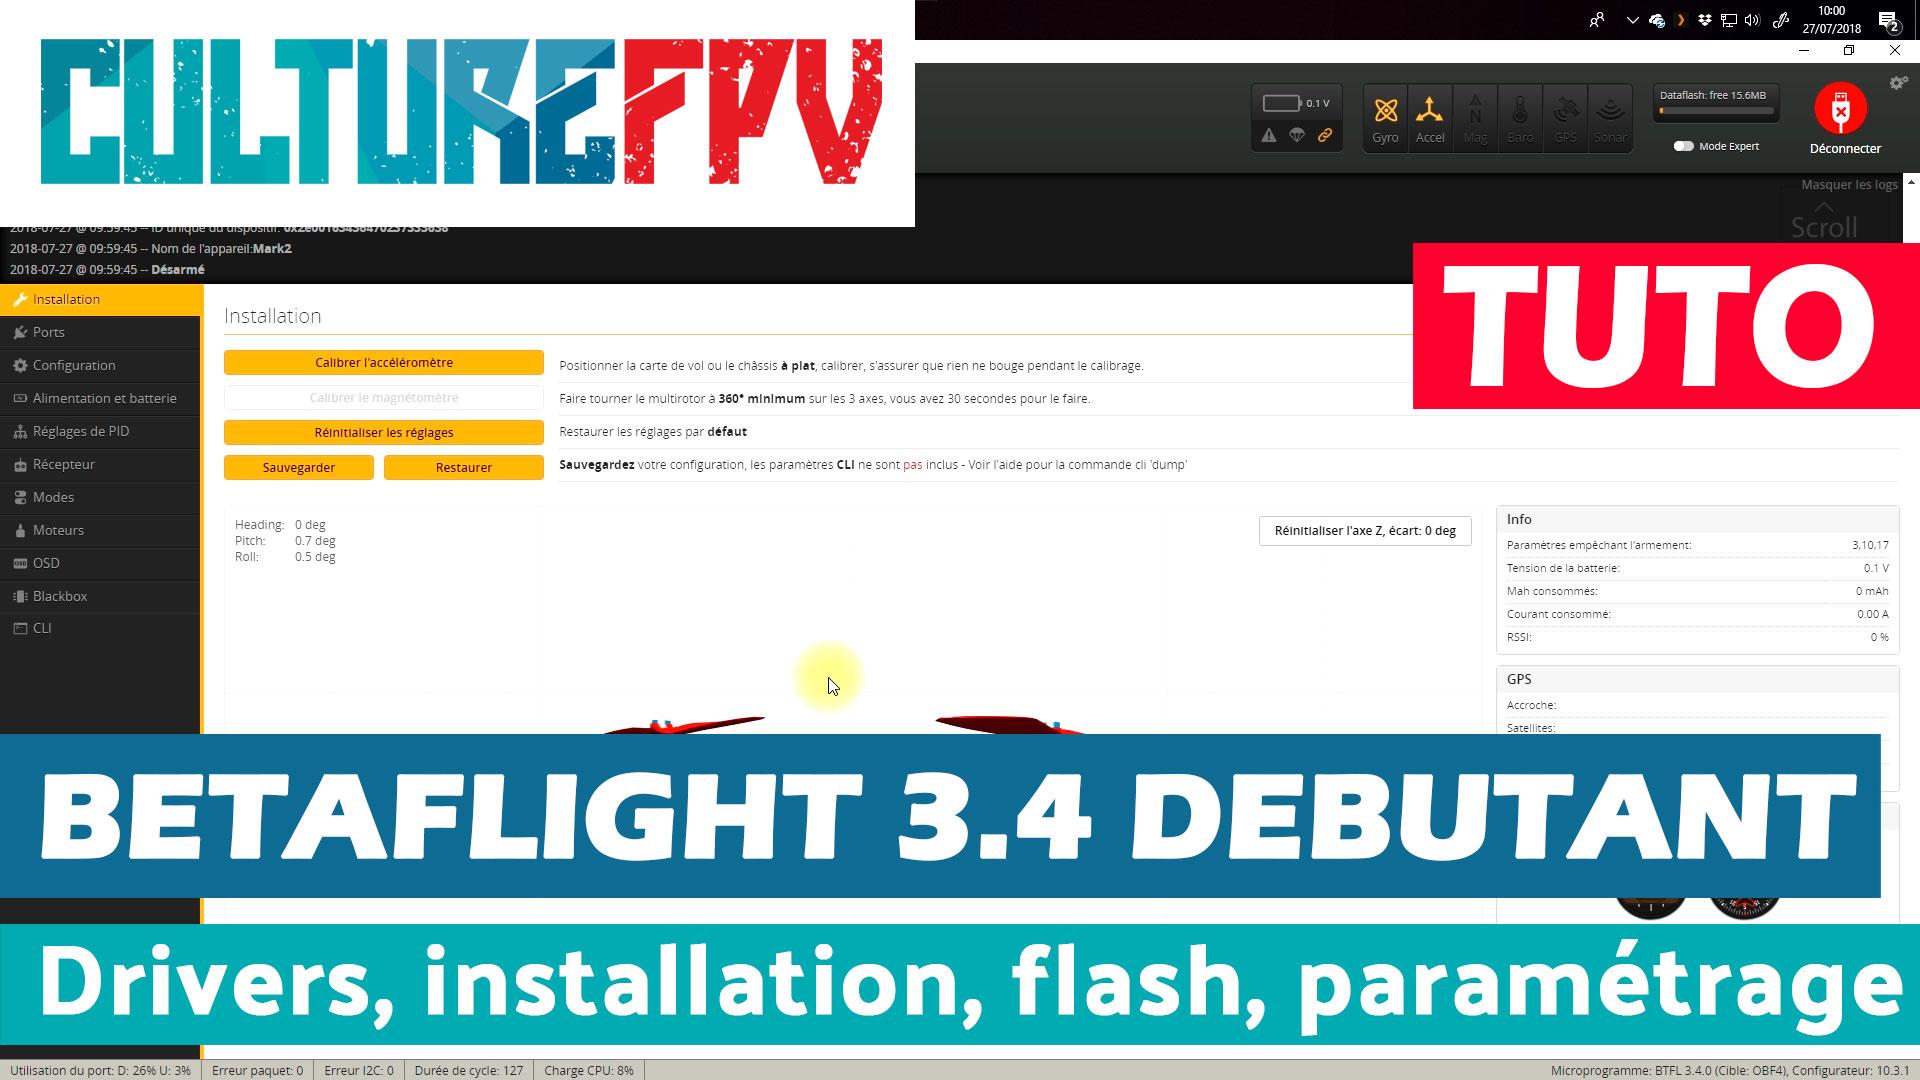 betaflight 3.4 débutant